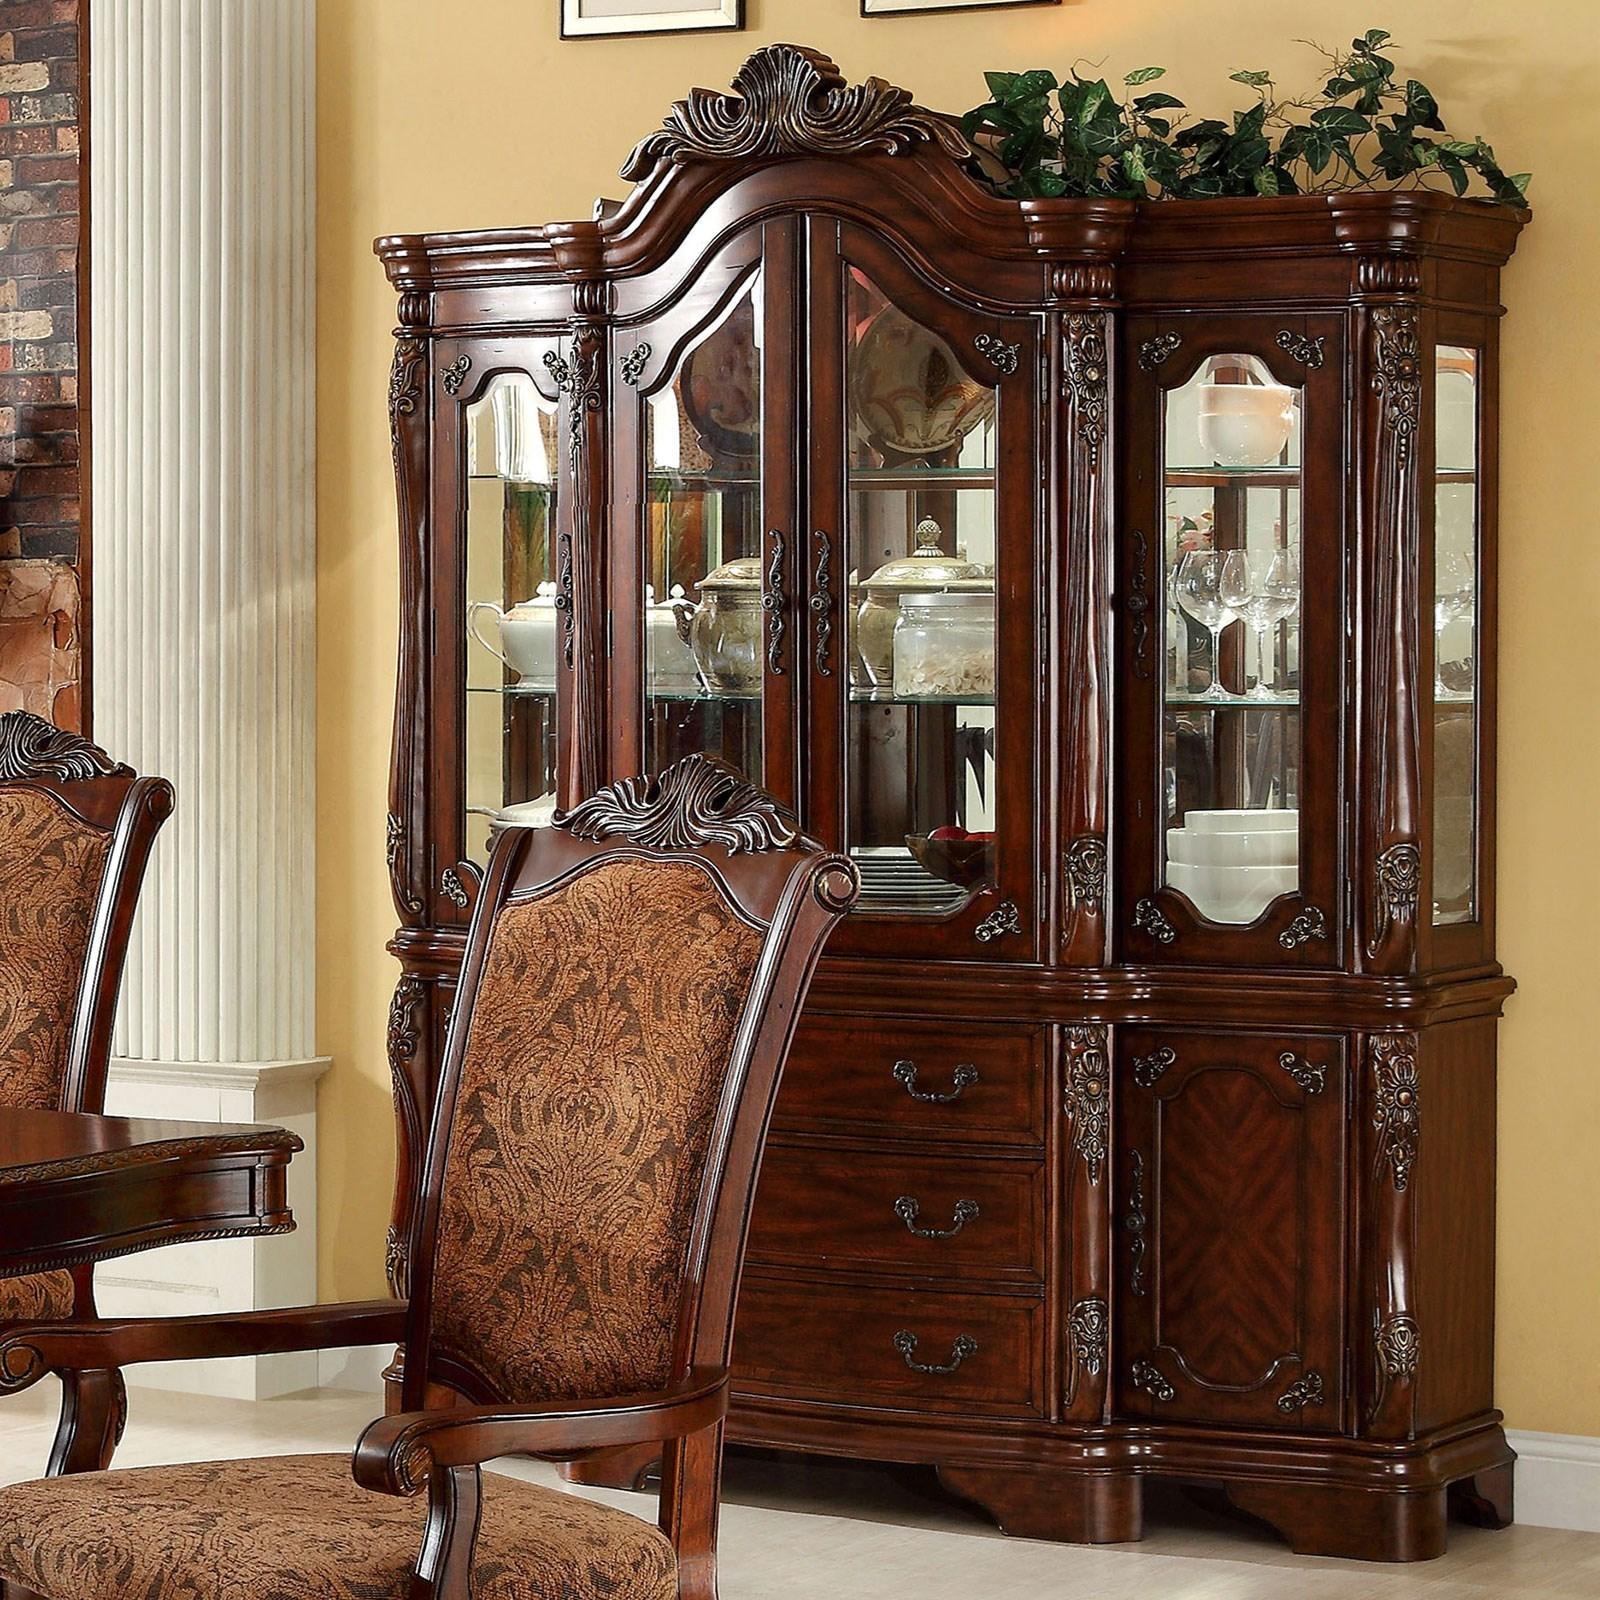 Cromwell China Cabinet by Furniture of America at Nassau Furniture and Mattress